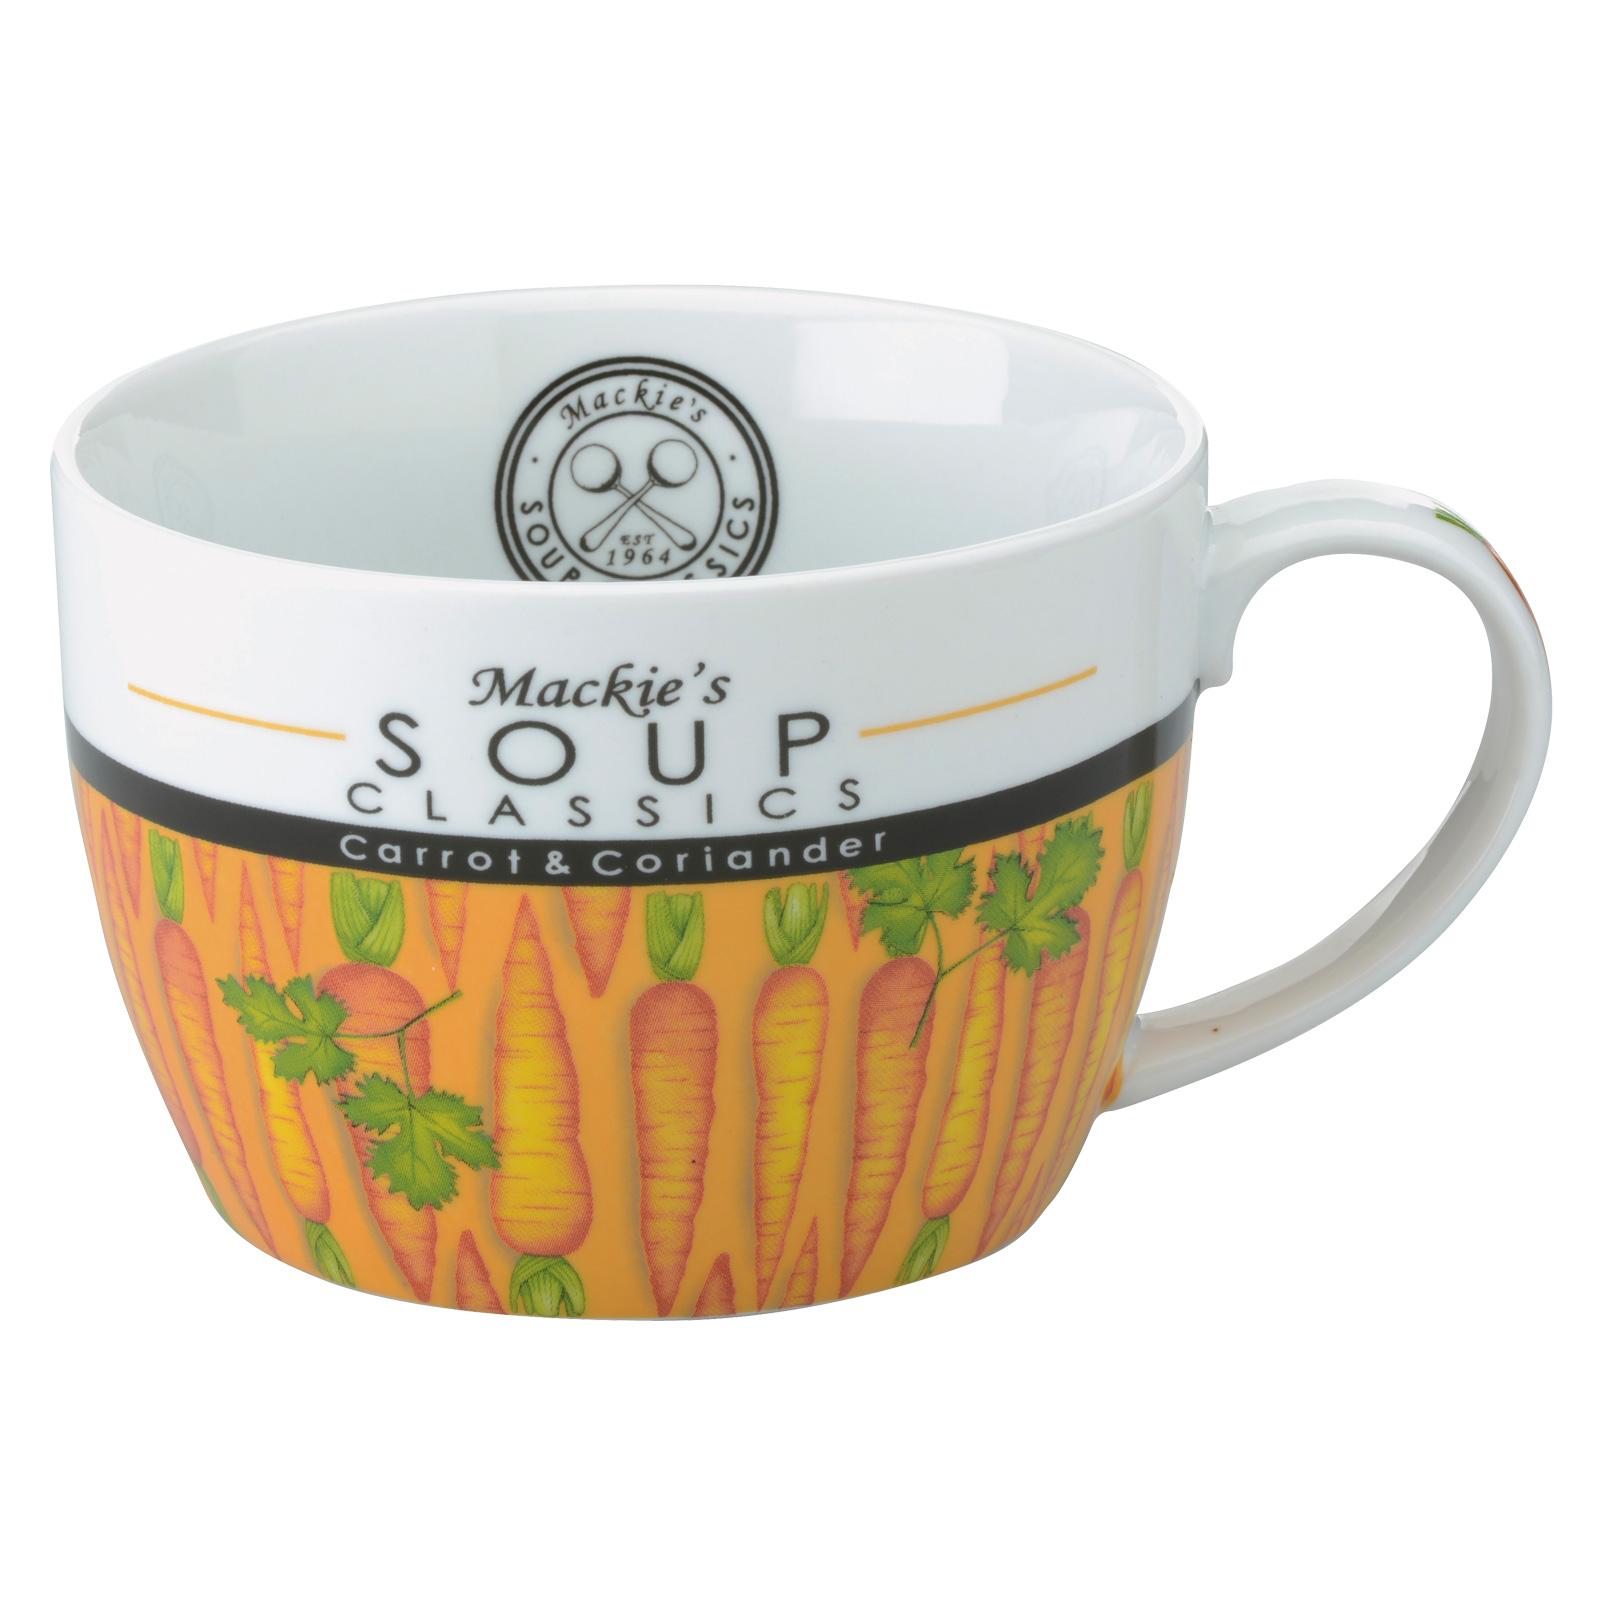 Mackie's Carrot & Coriander Soup Mug